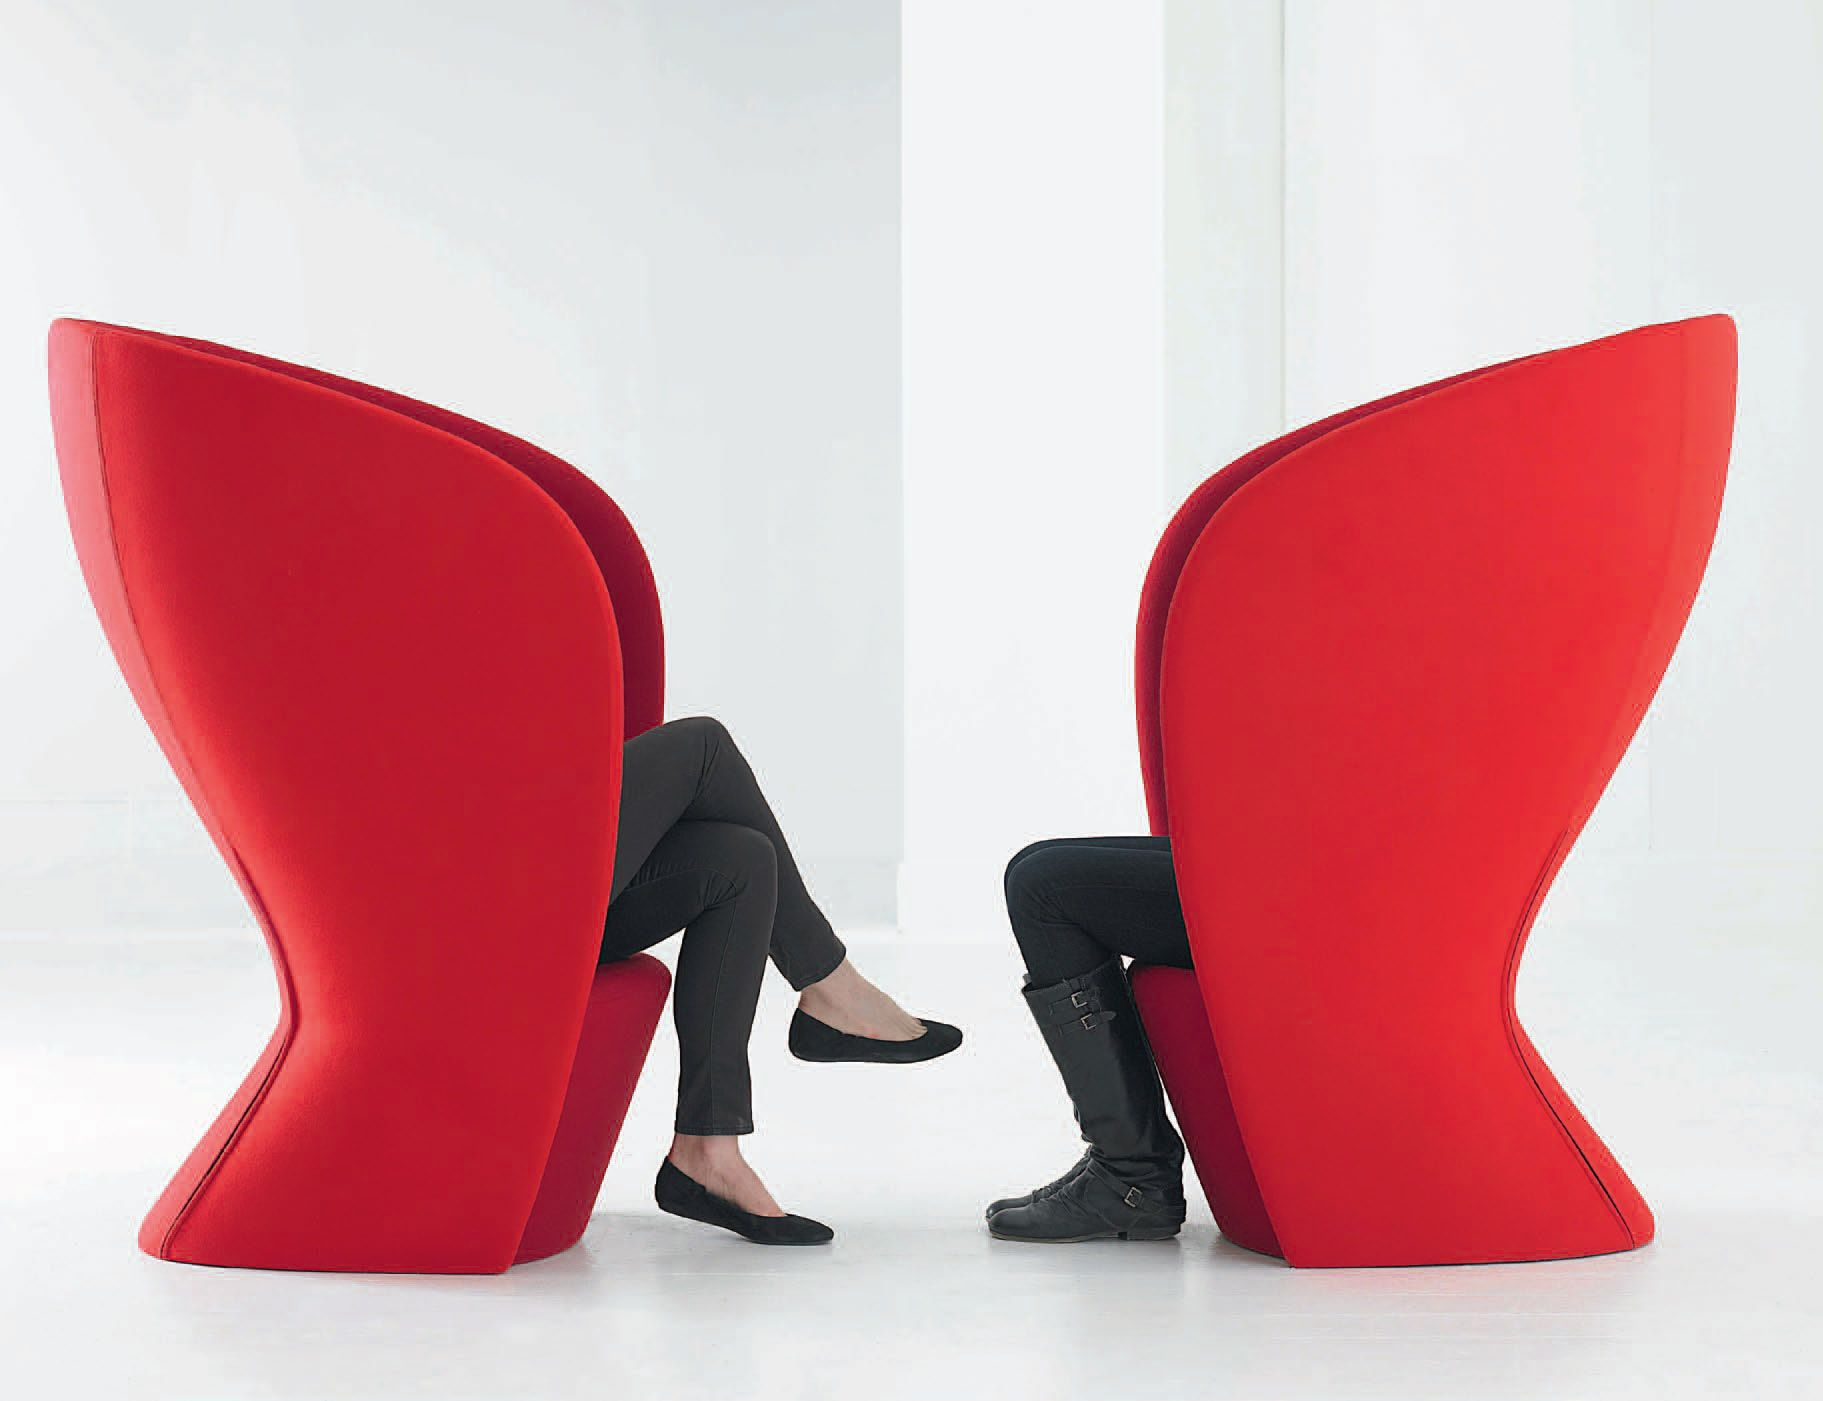 HighTower - Access Lounge Seat